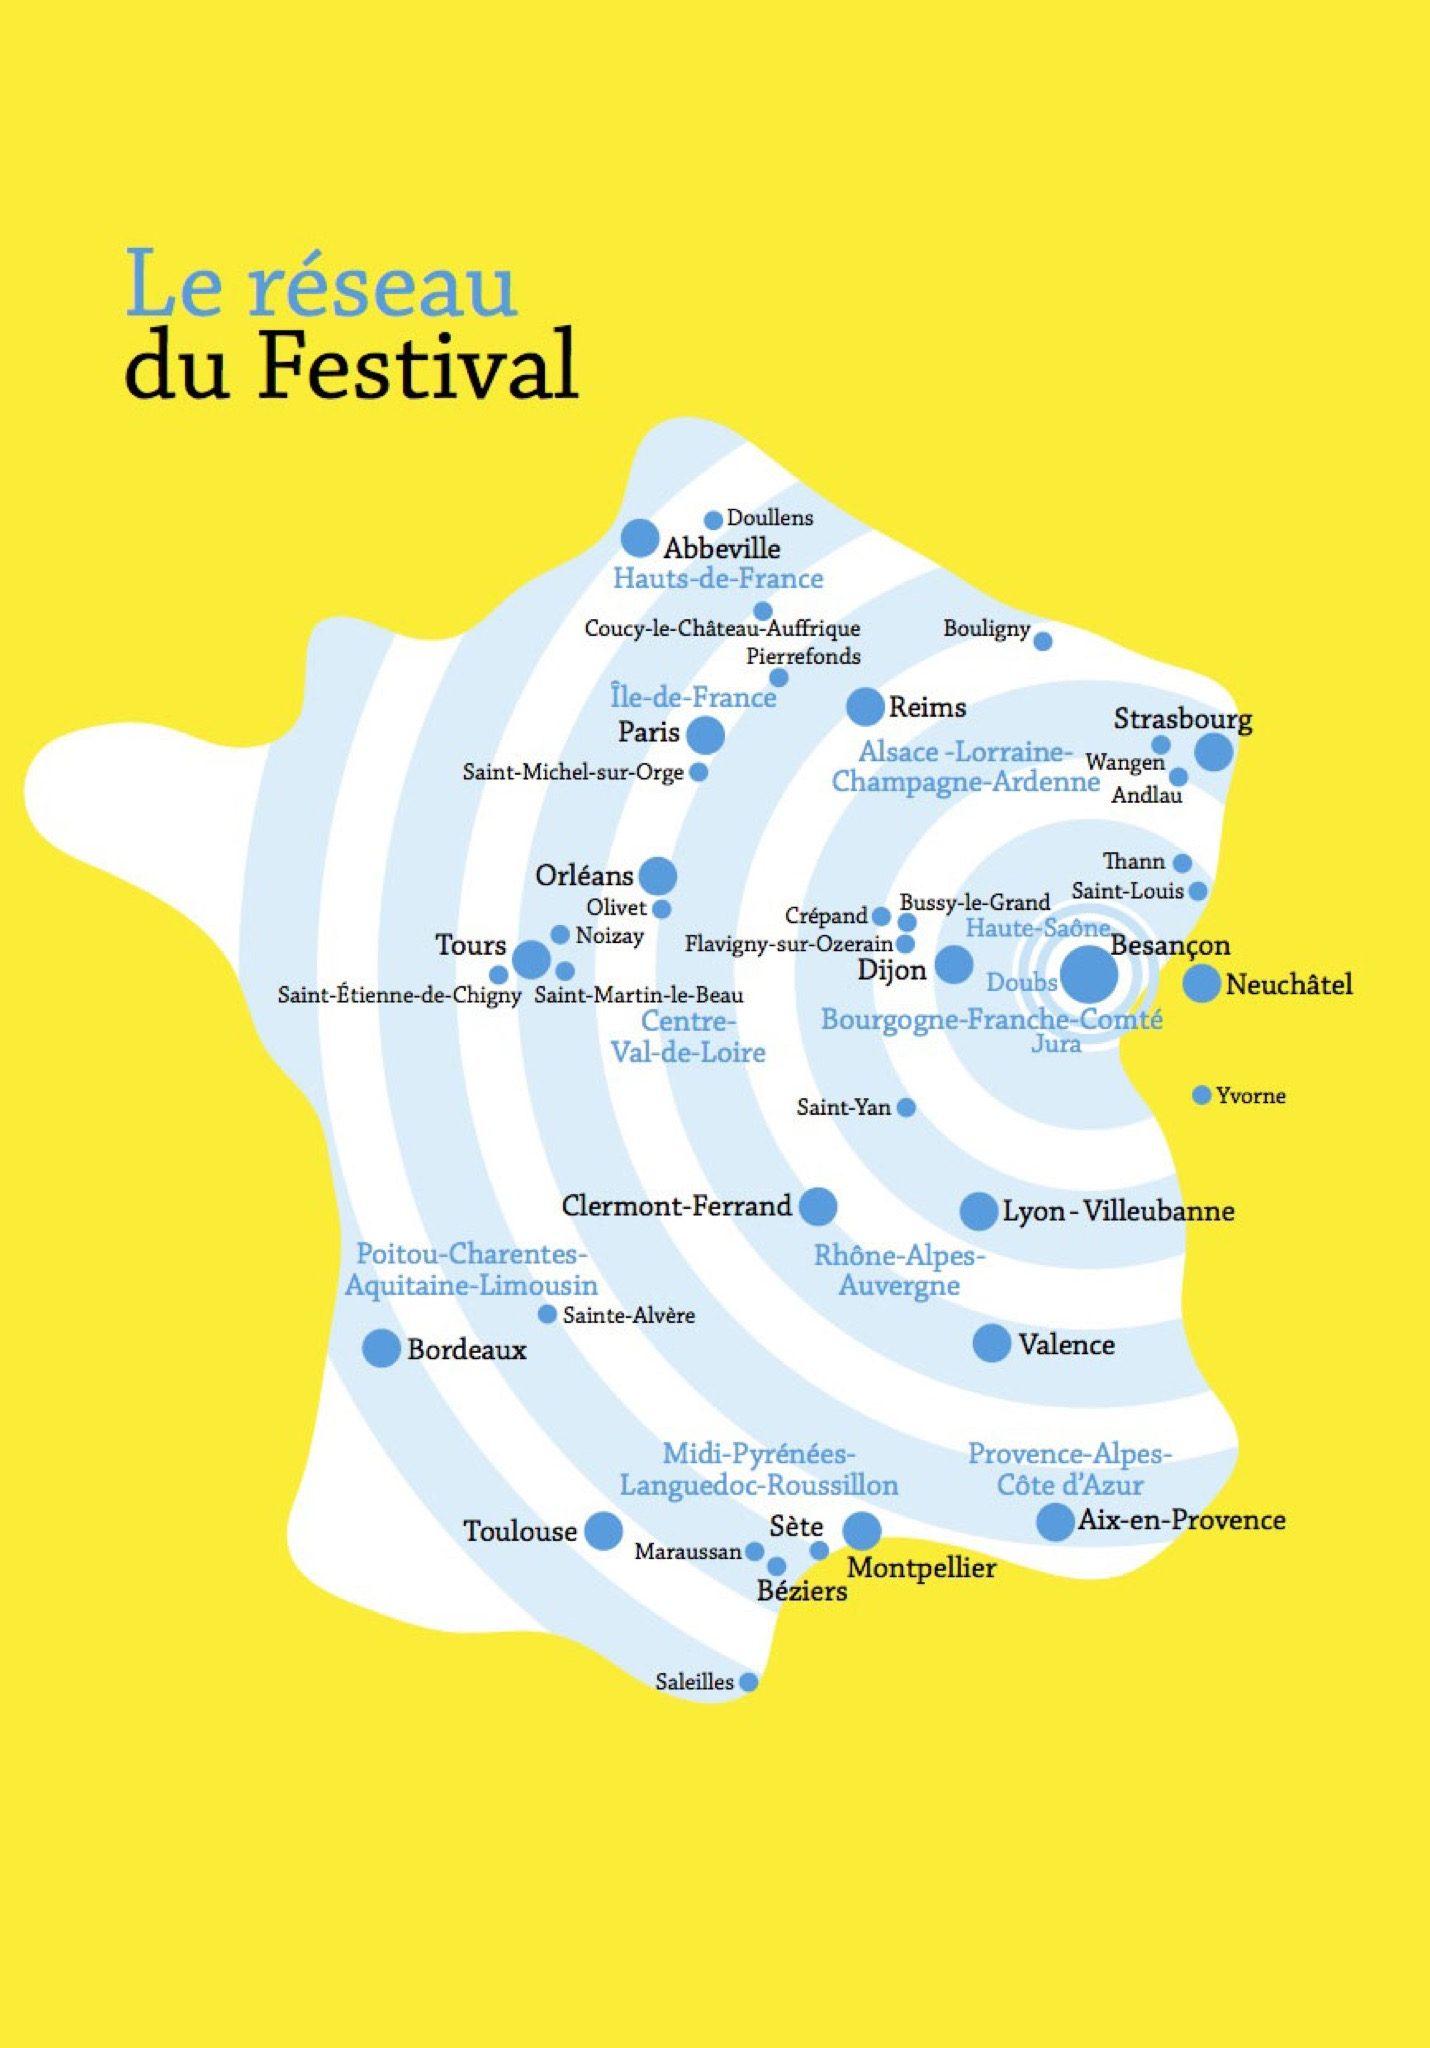 -Festival-de-Caves 2016 image carte